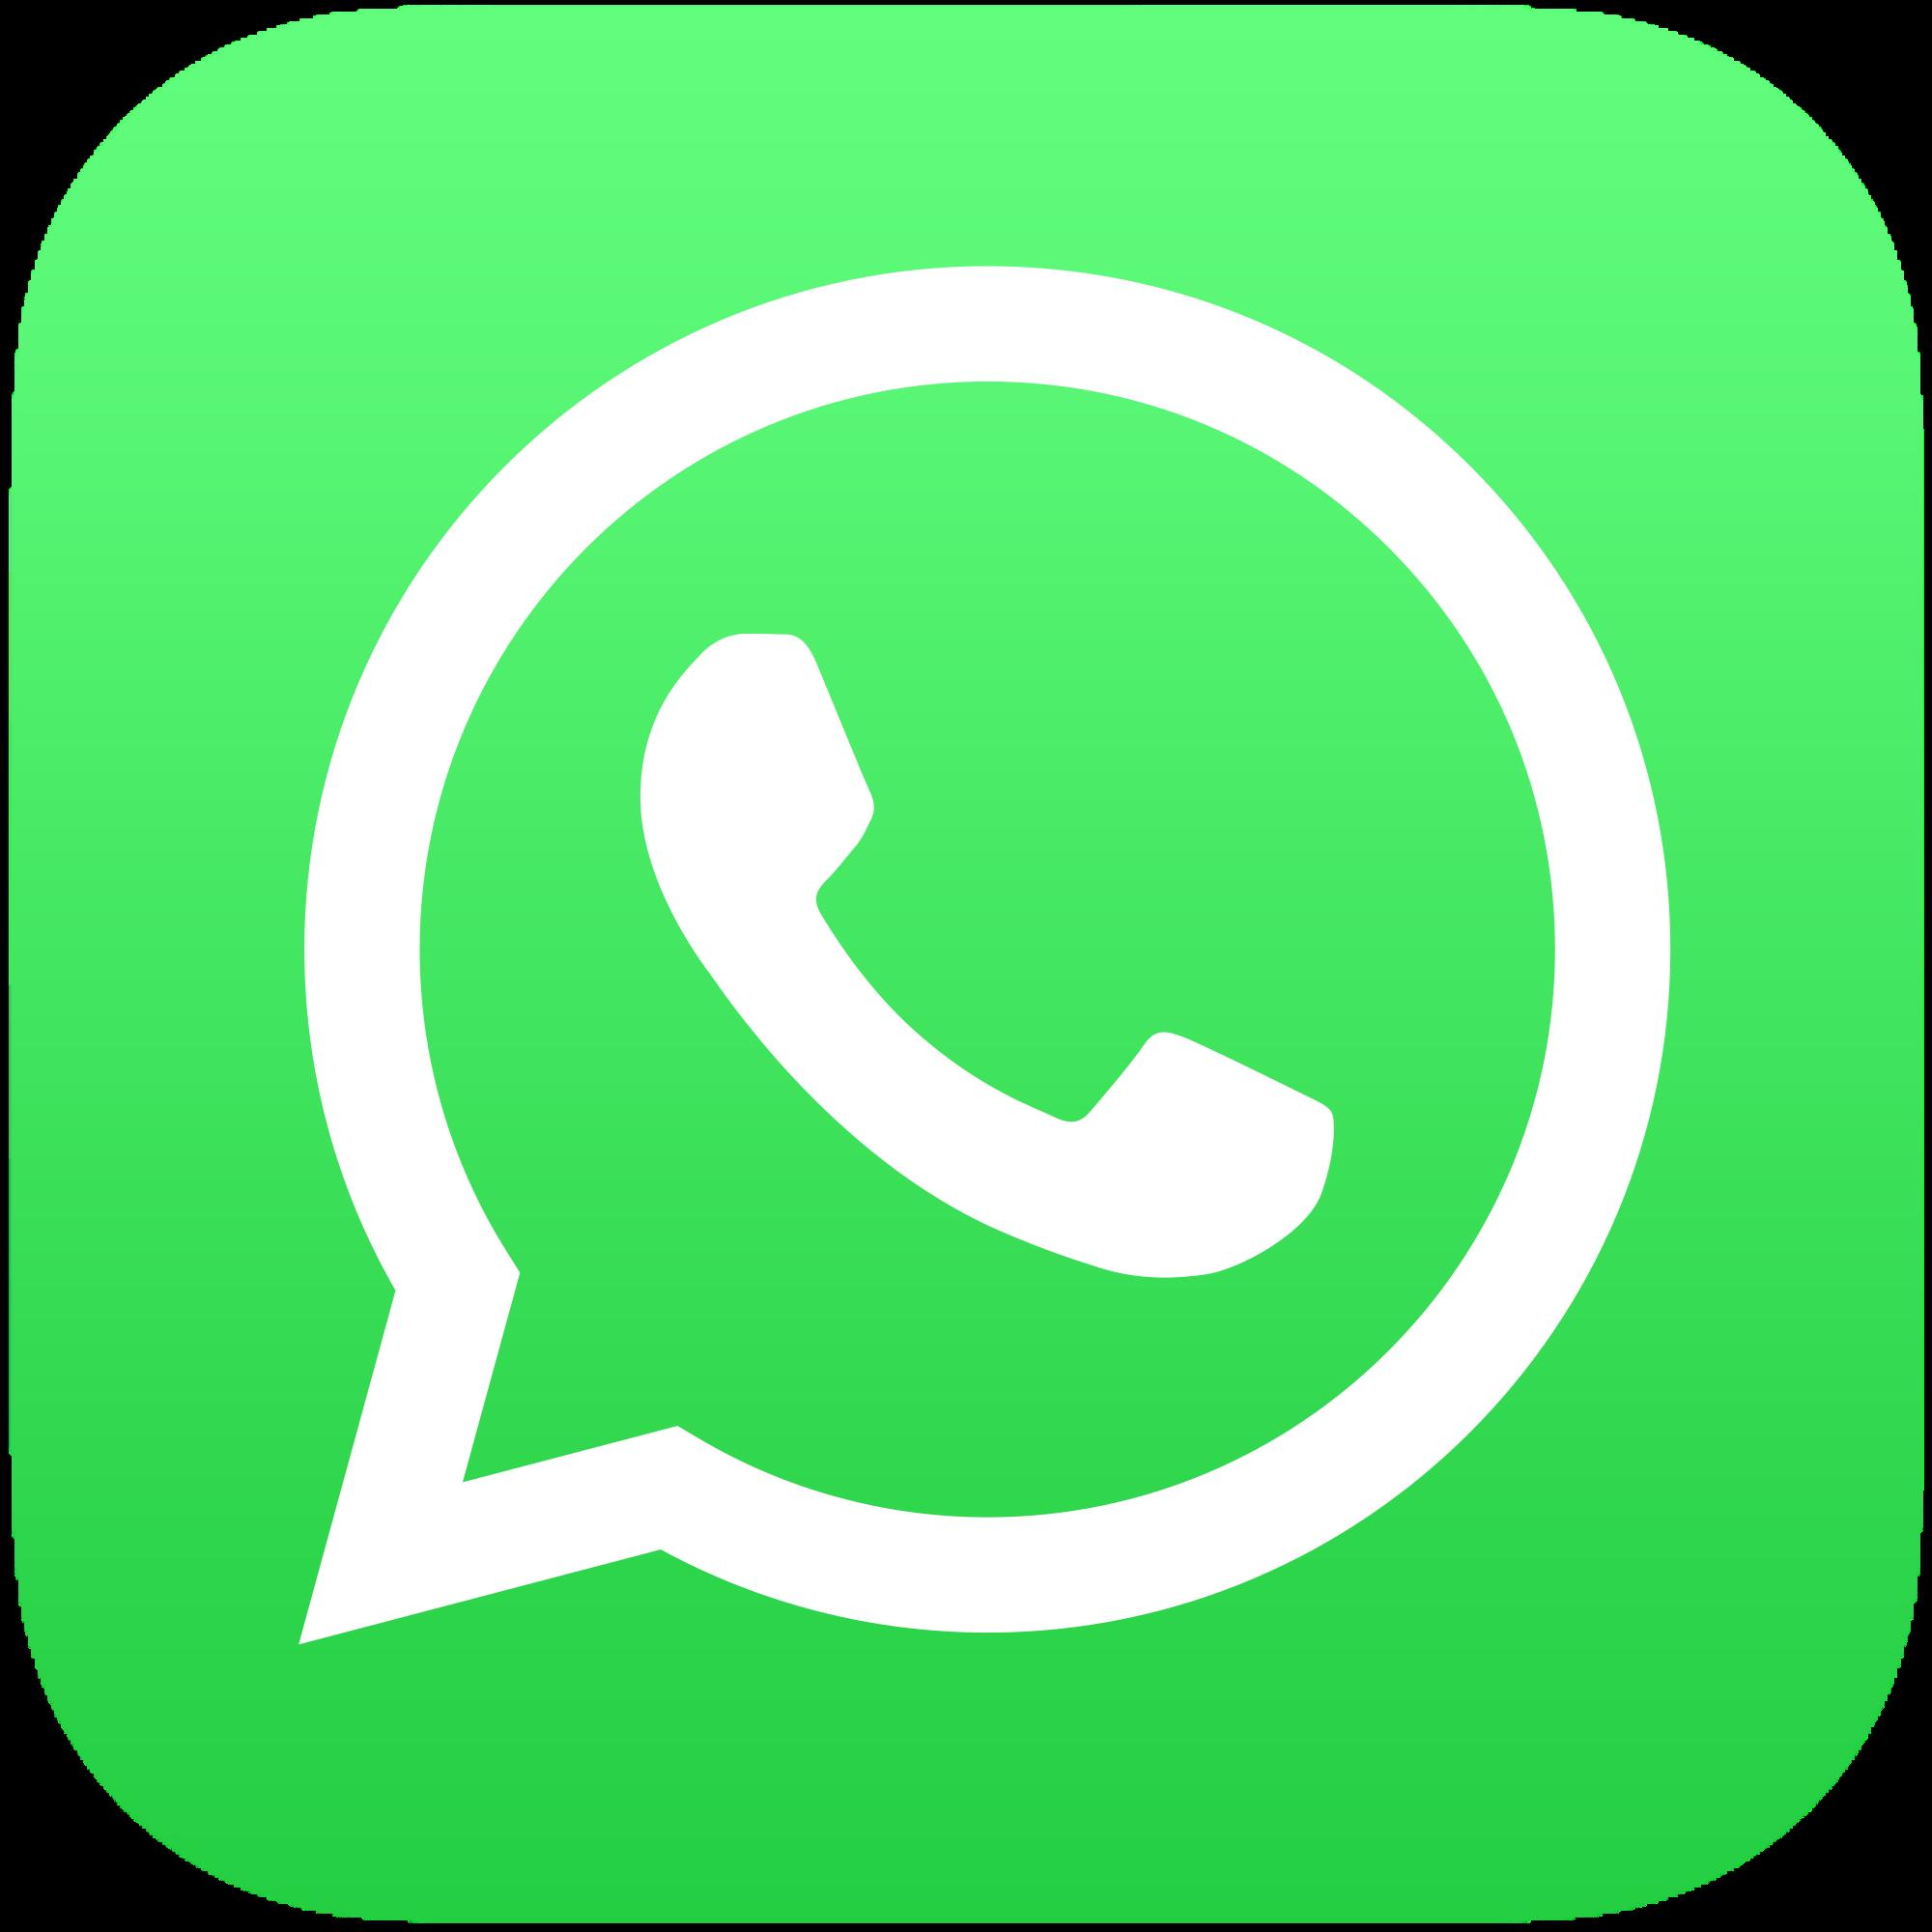 Whatsapp PNG - 173283